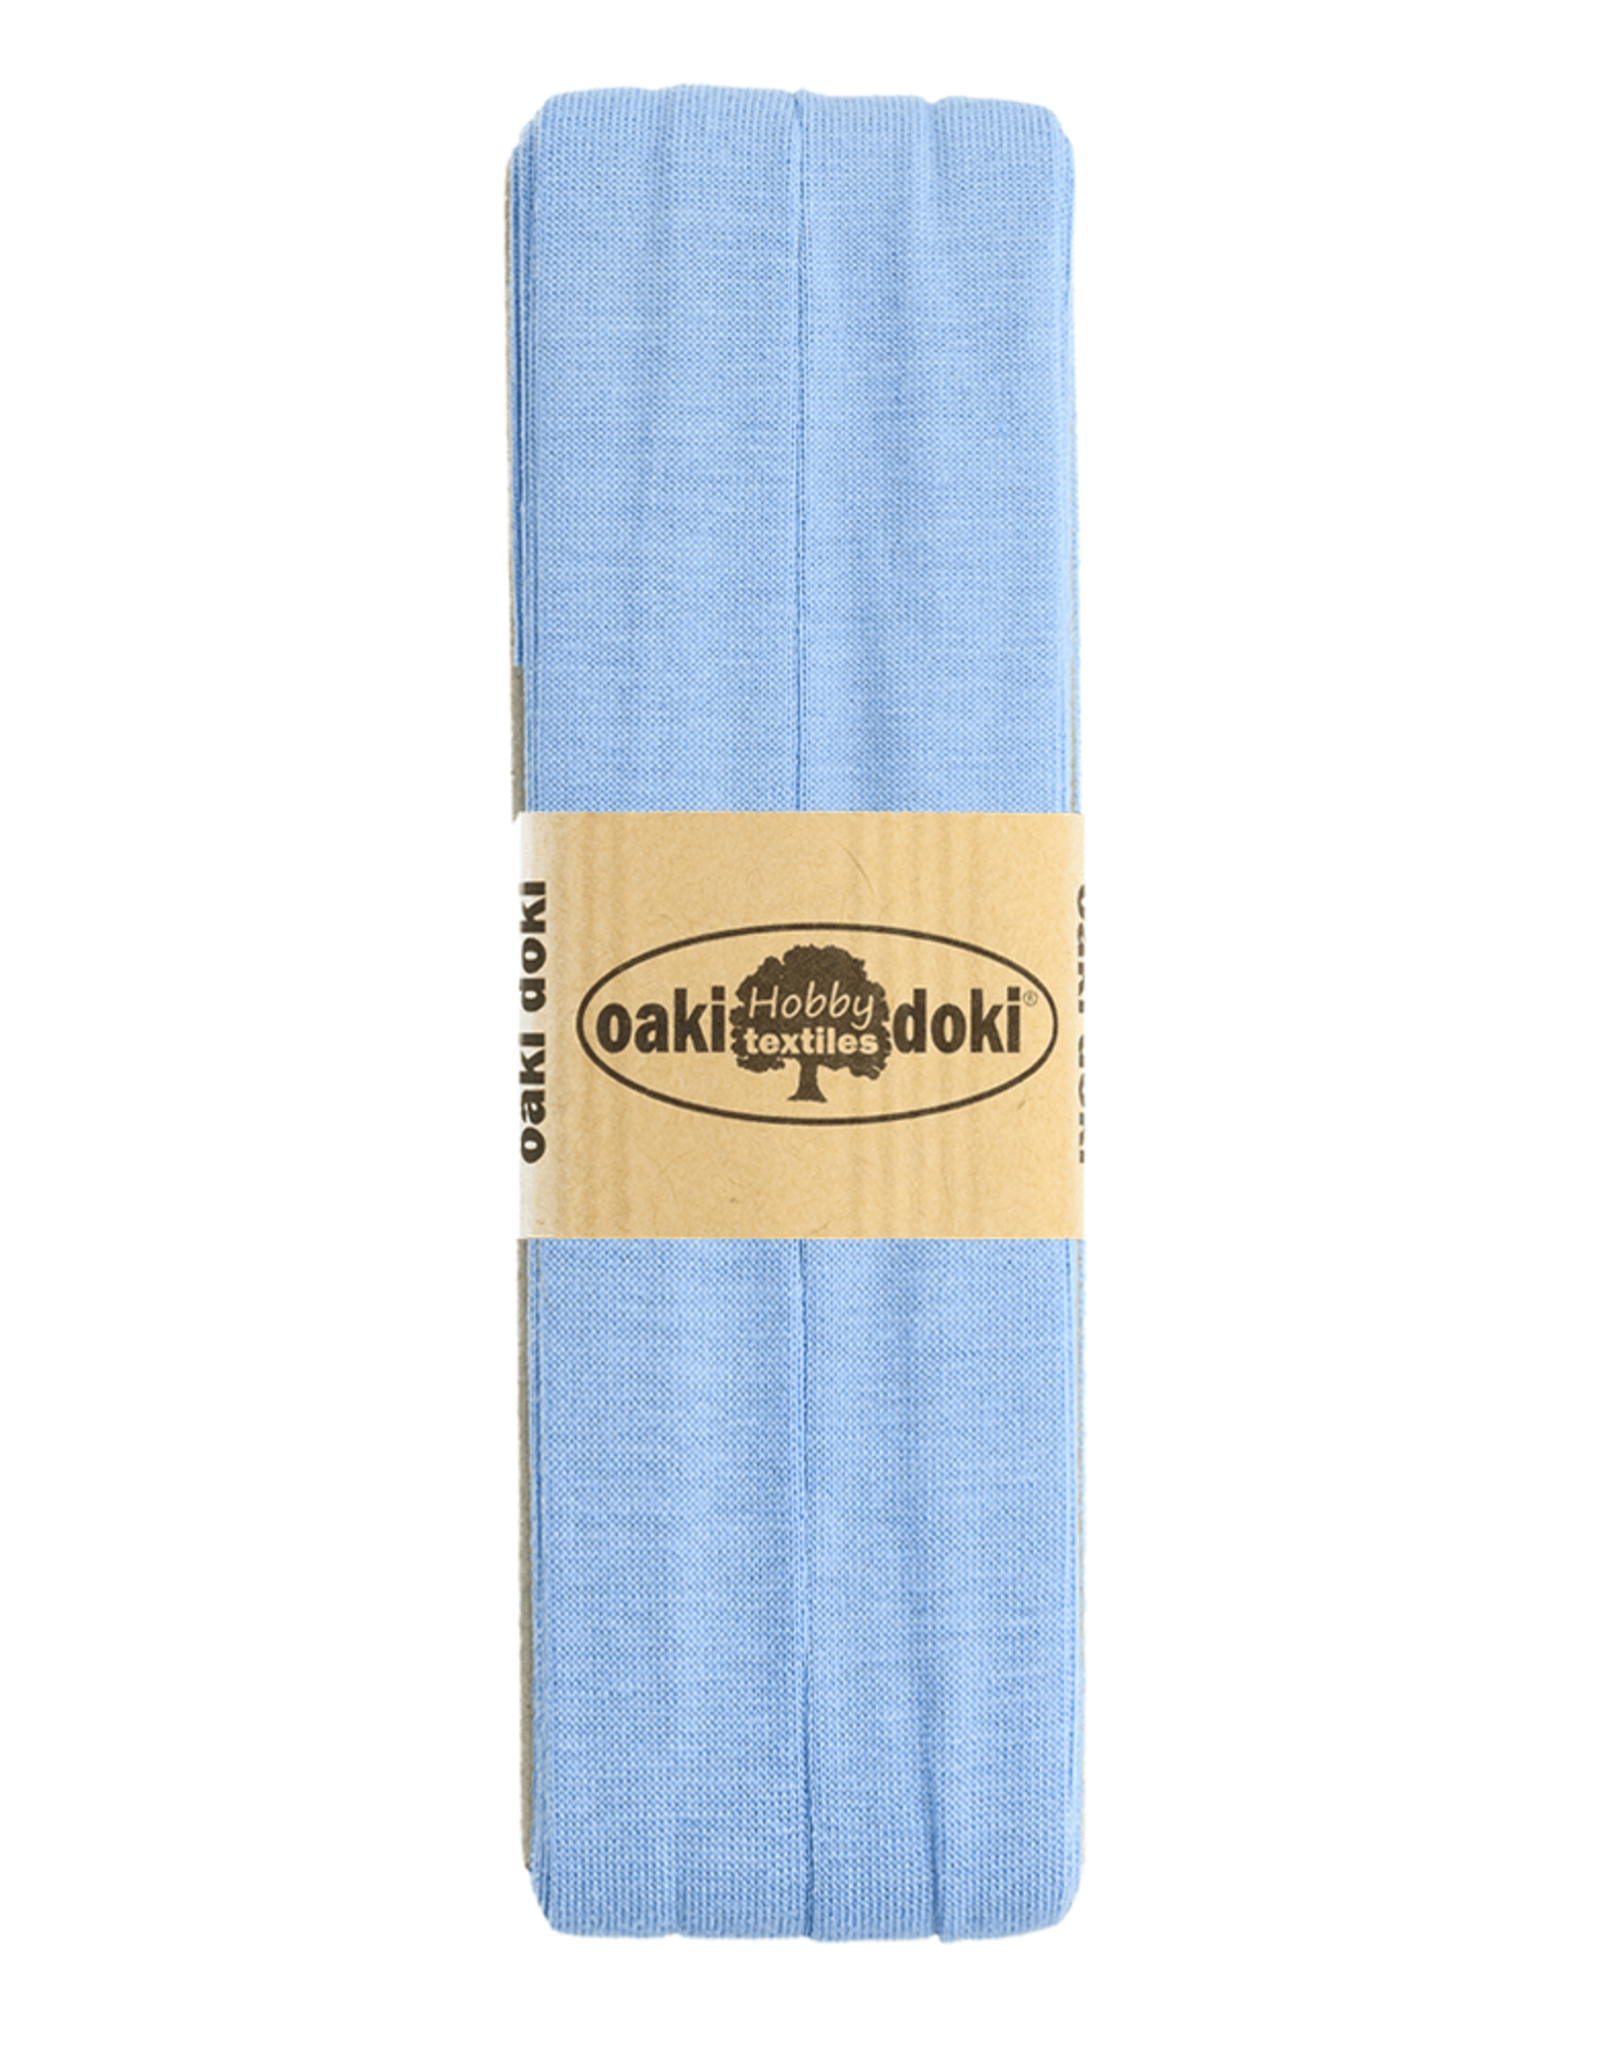 Oaki Doki Biais - Tricot - Lichtblauw